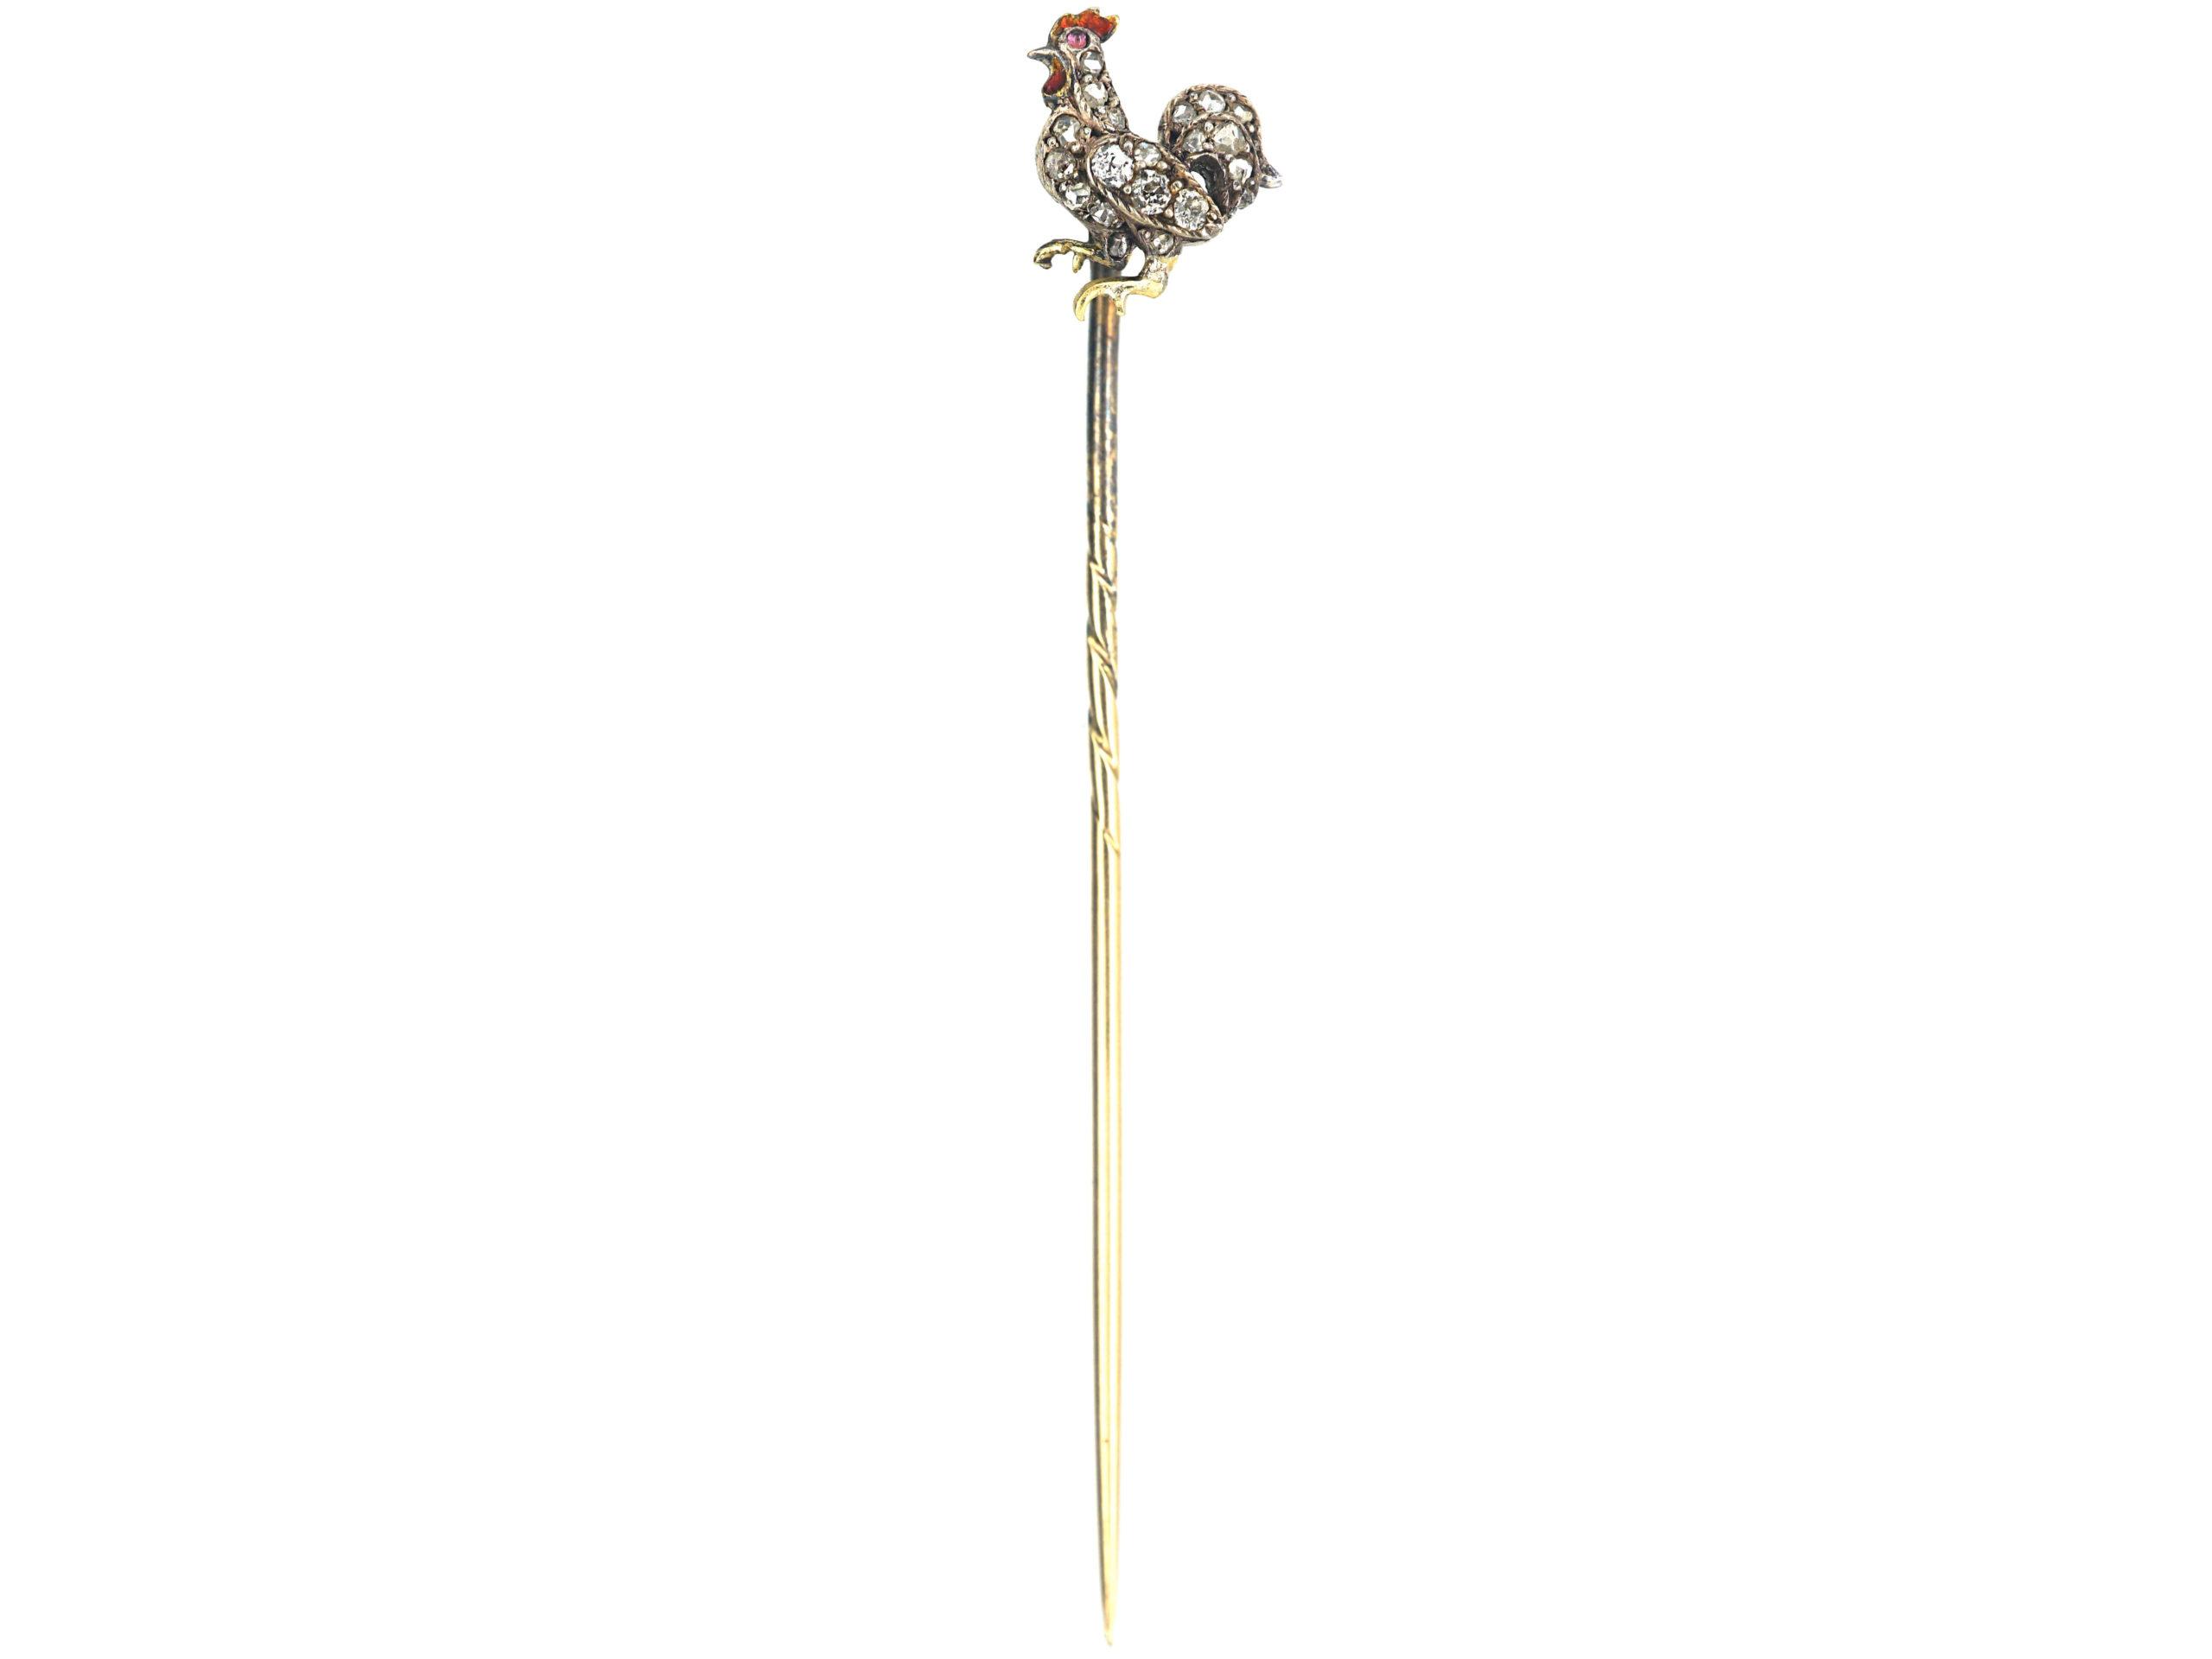 Edwardian 15ct Gold & Silver Enamel & Rose Diamond Cockerel Tie Pin